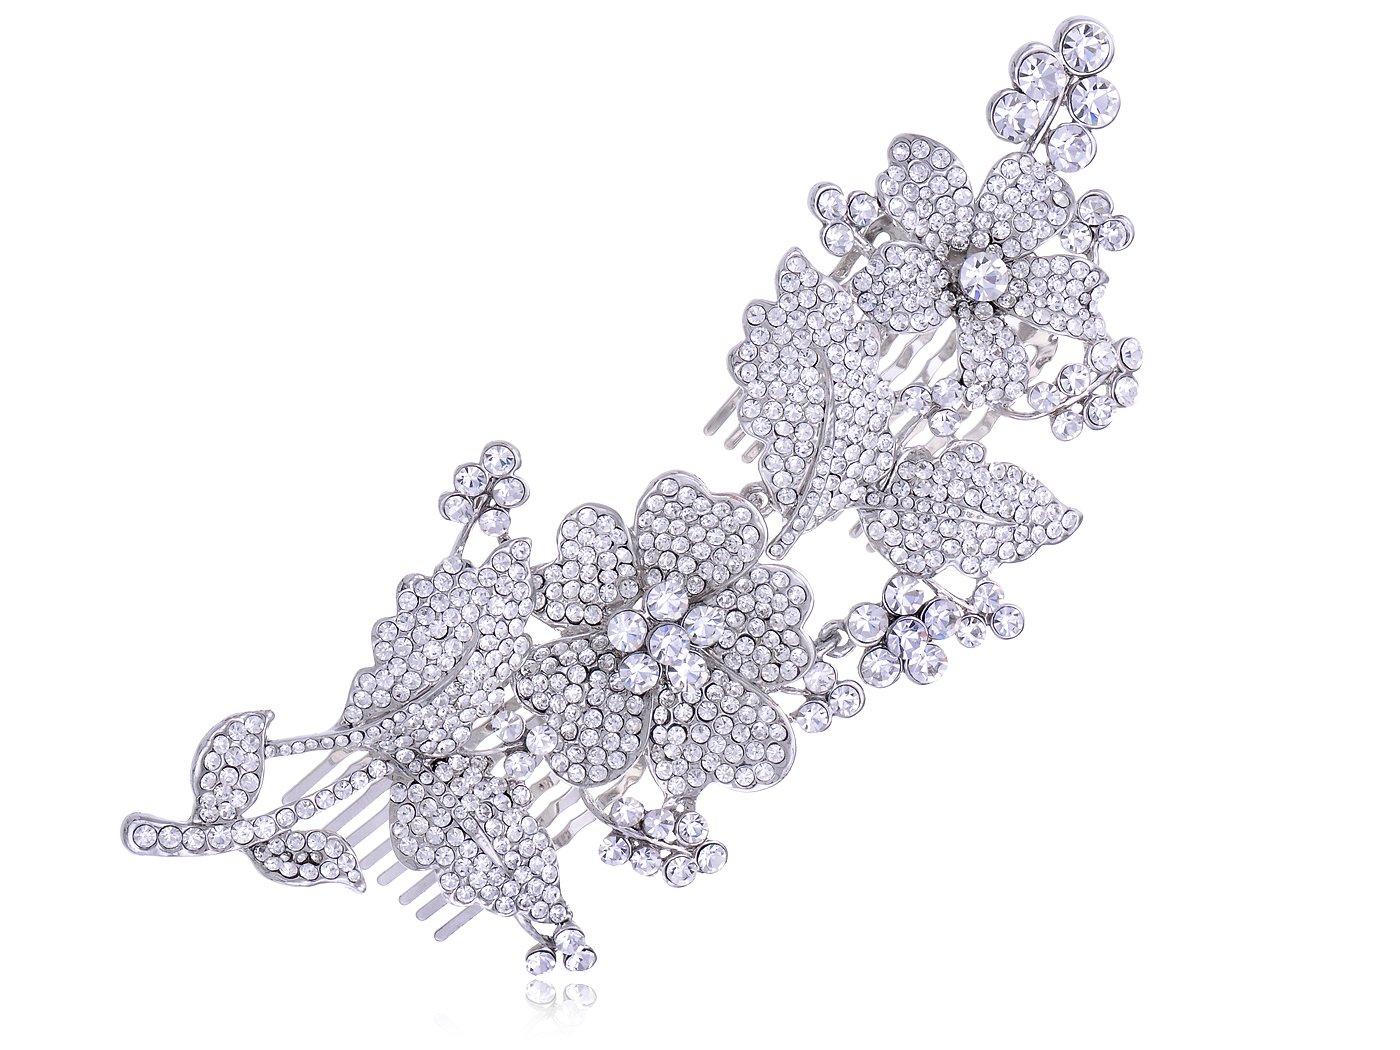 Alilang Silvery Tone Crystal Rhinestone Flower Leaf Bridal Long Hair Comb